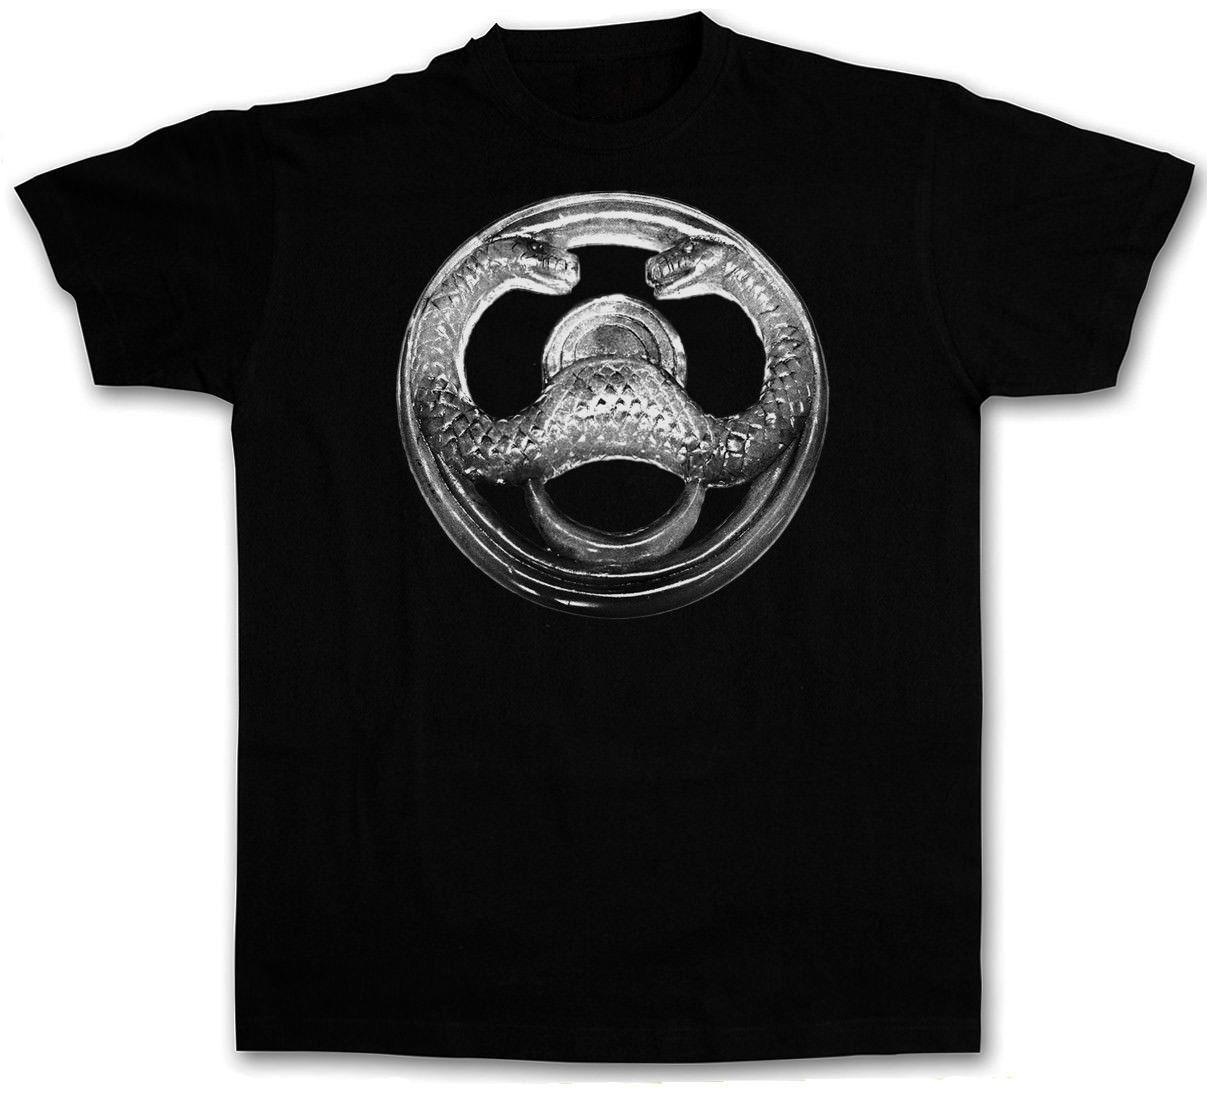 T-shirt engraçado Thulsa Doom Logo I Camiseta Conan Filme Barbarian Arnold Schwarzenegger Cult manga curta